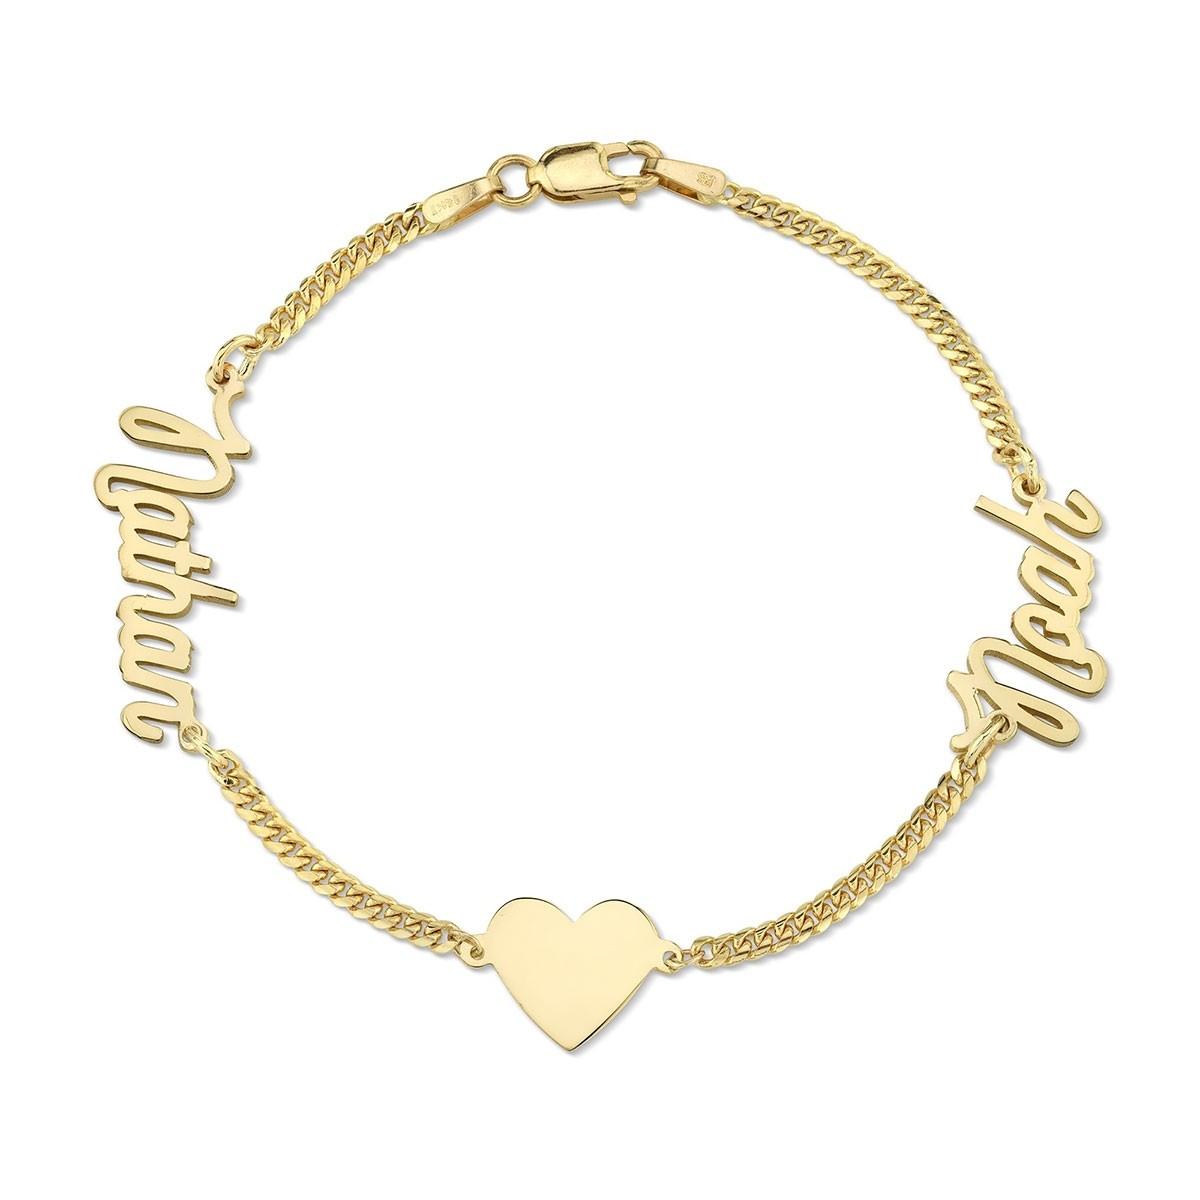 14k Yellow Gold Mini Cuban Link Personalized Script Nameplate Floating Heart Bracelet